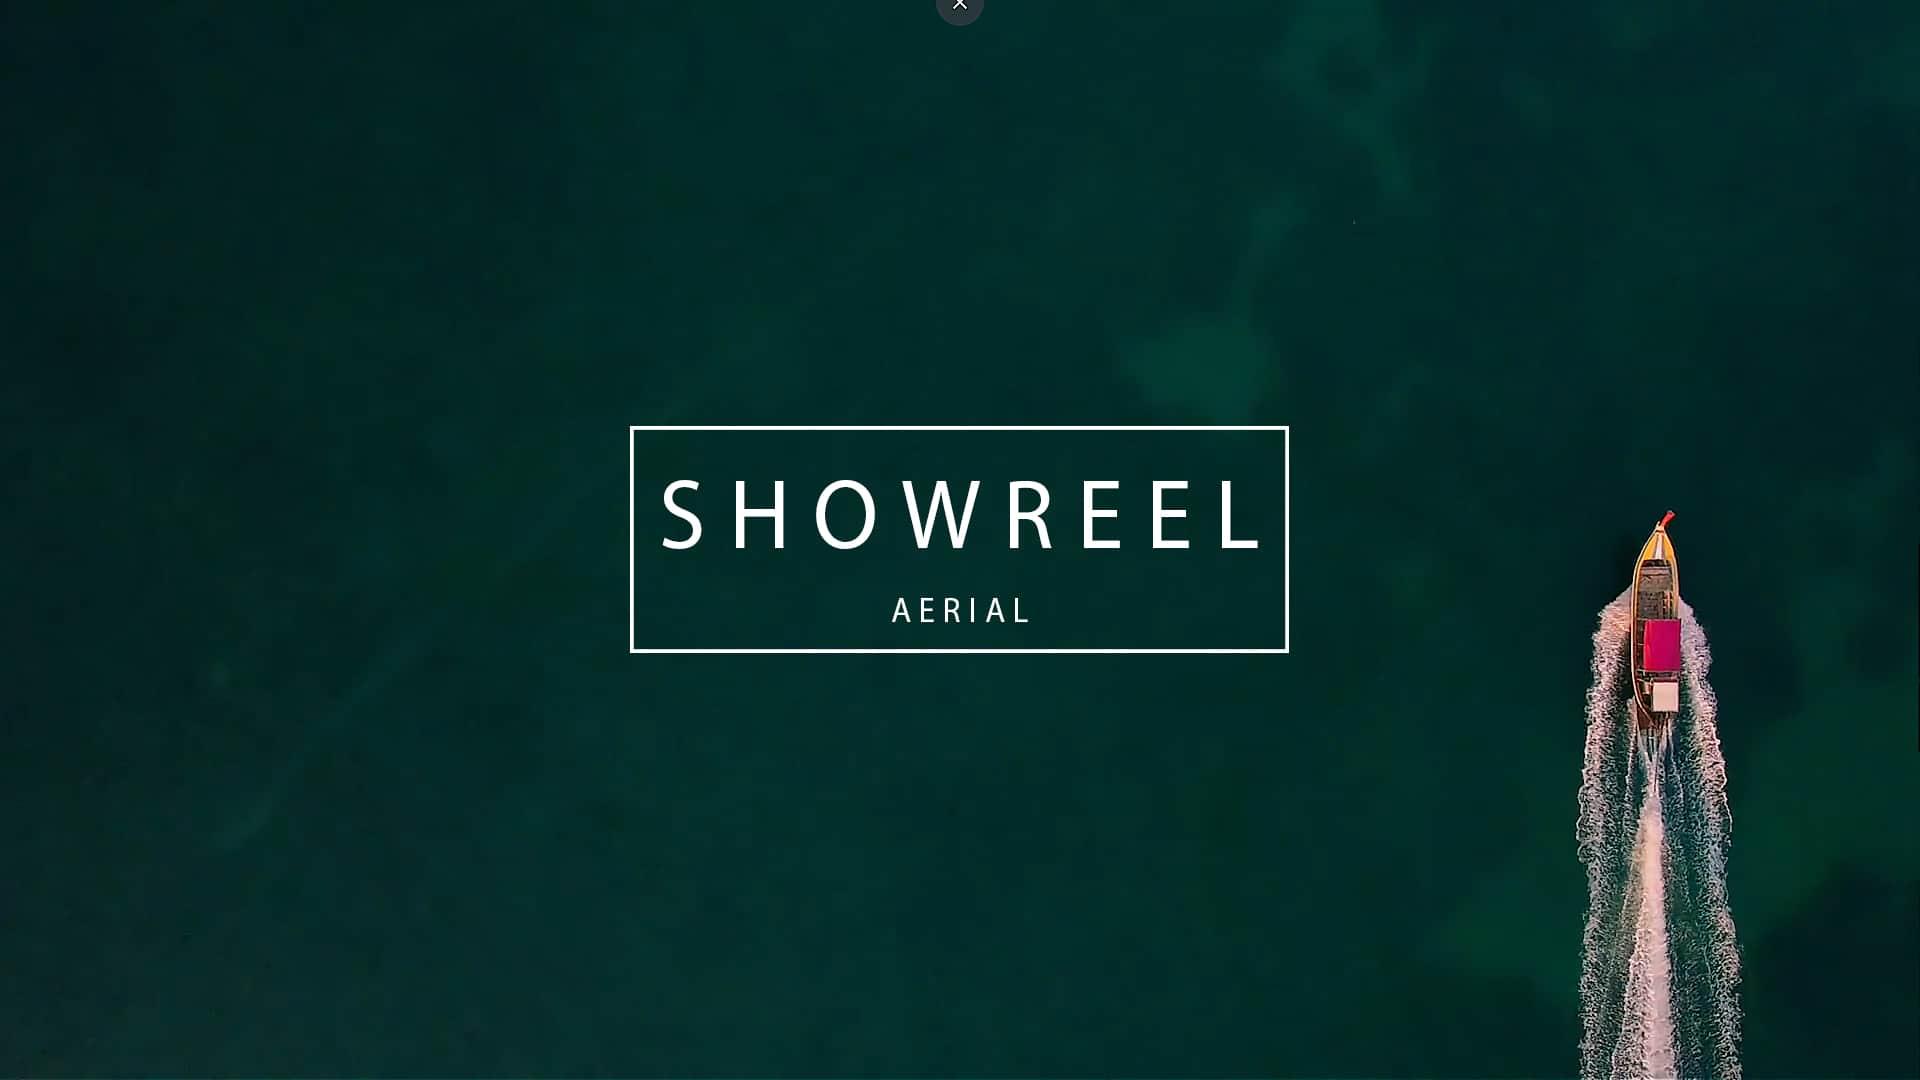 MM_Aerial-Showreel_vimeo